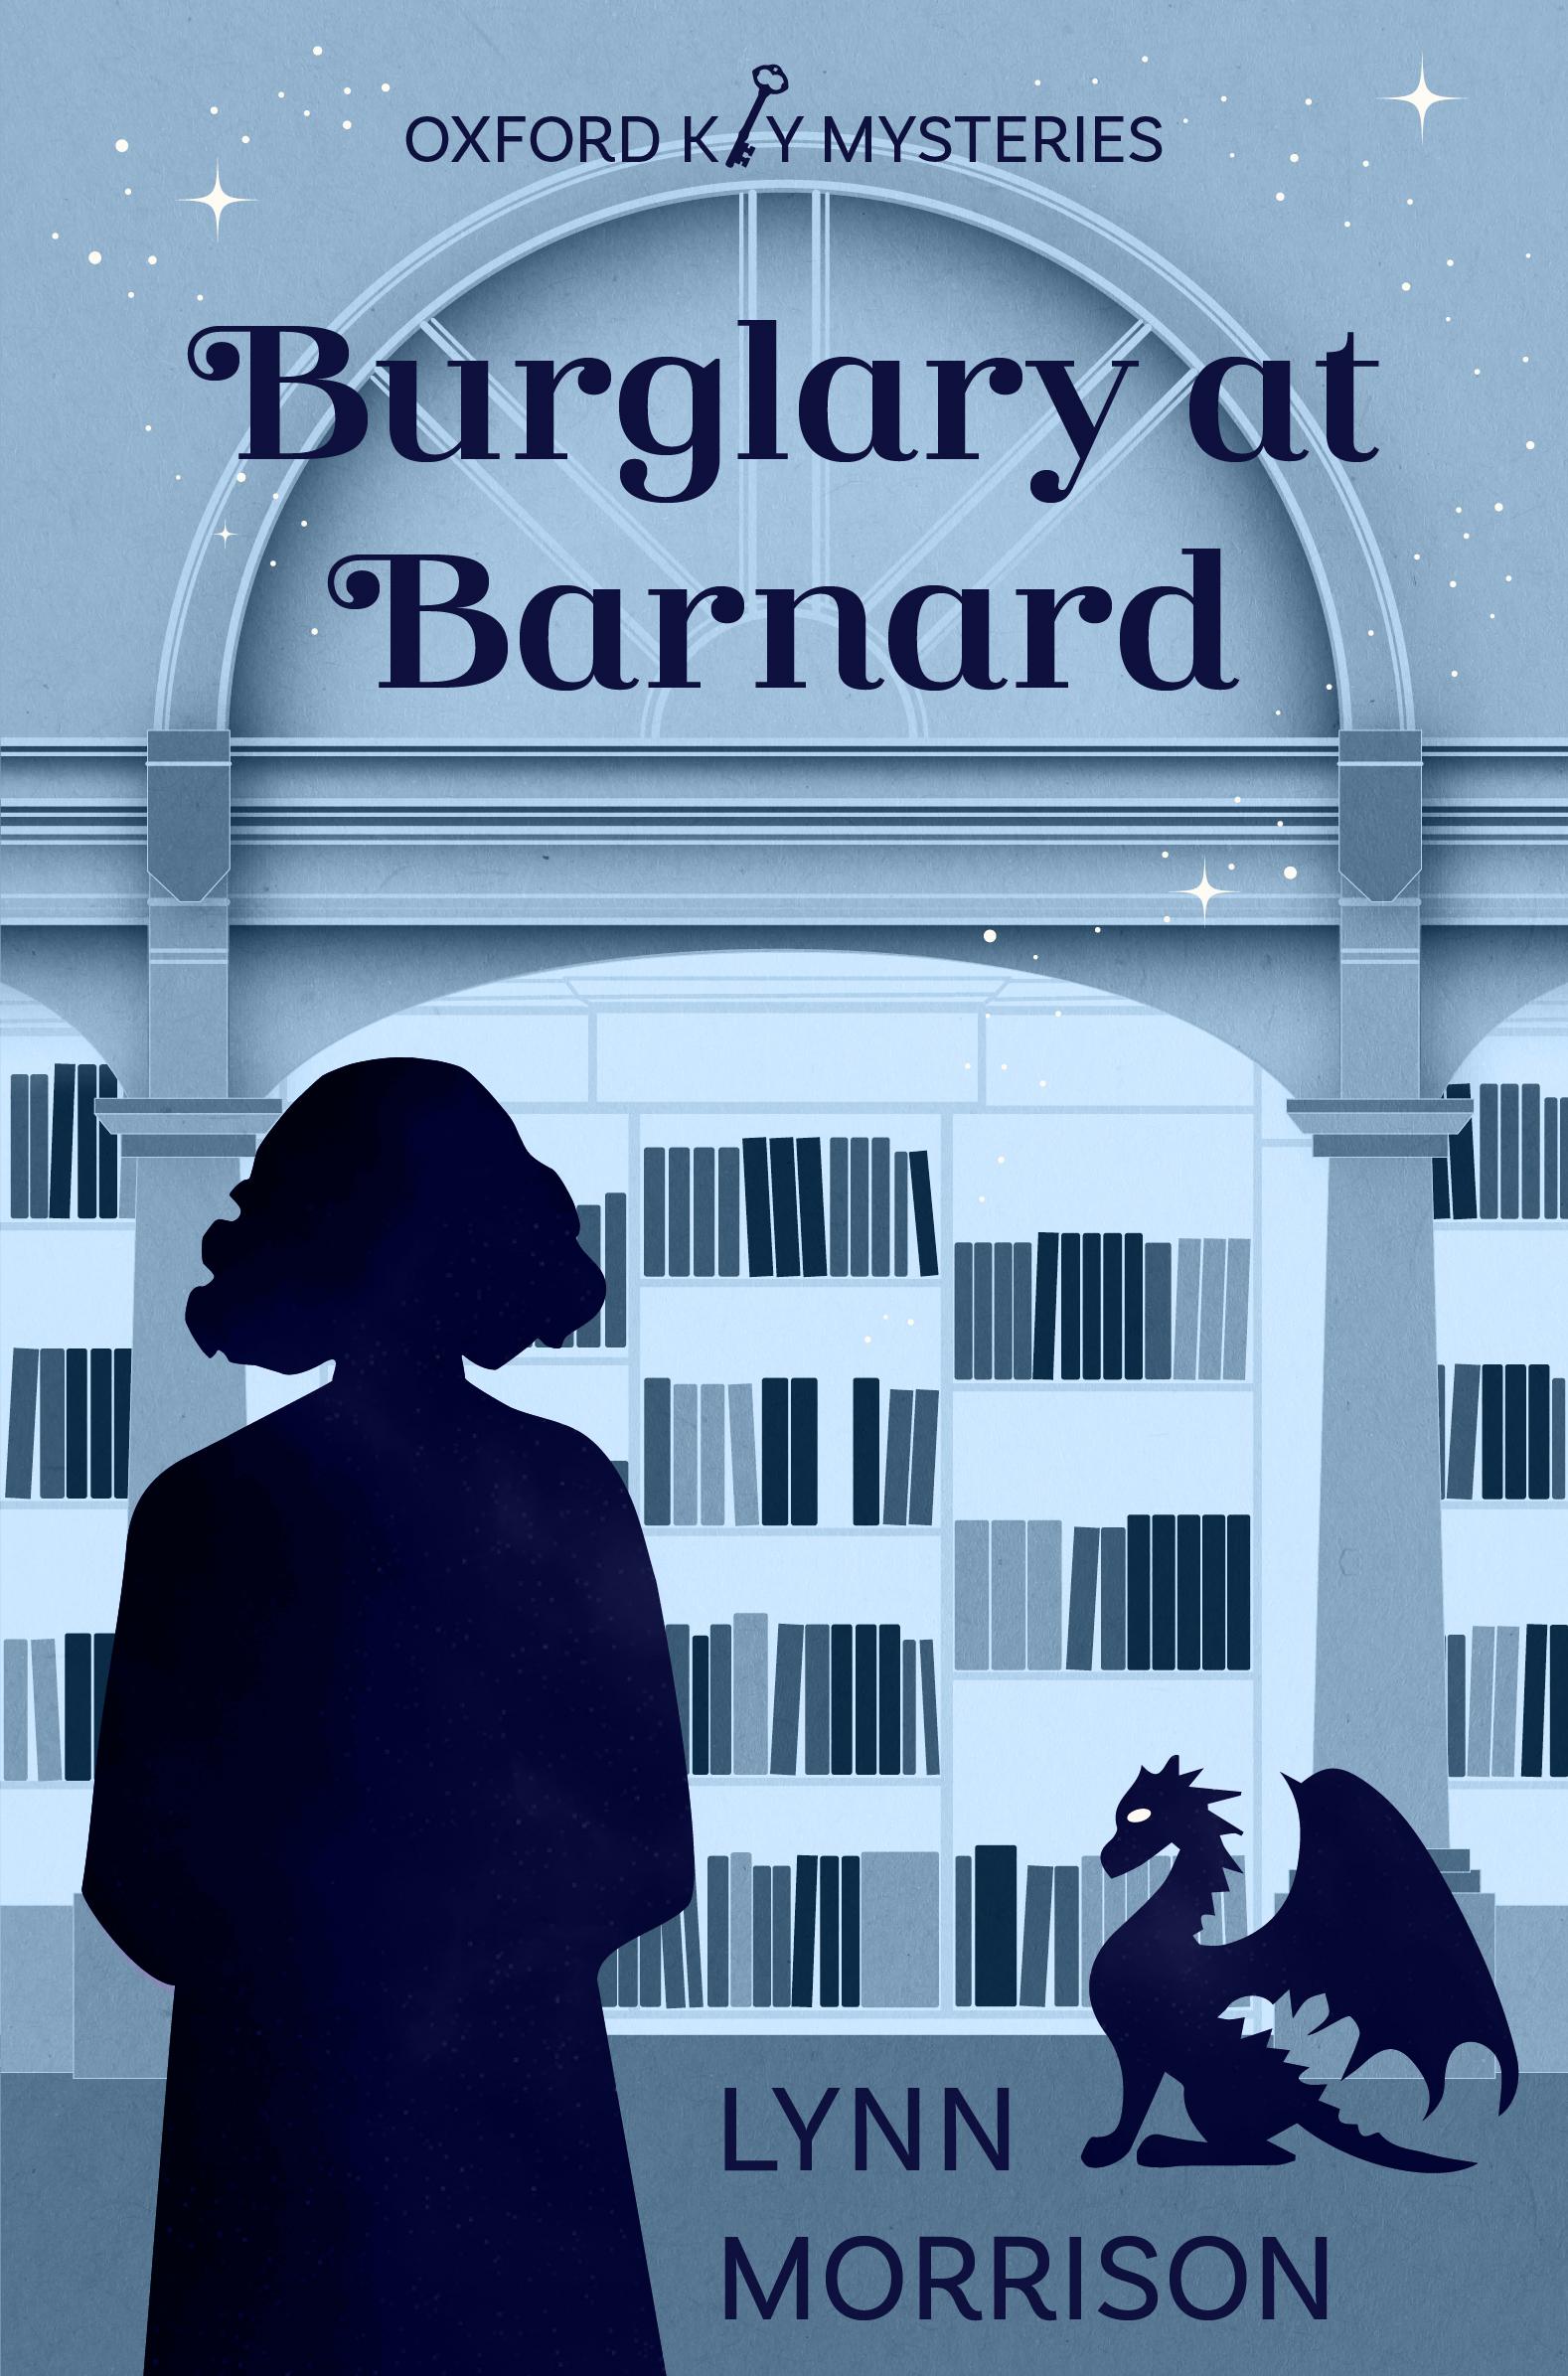 [PDF] [EPUB] Burglary at Barnard (Oxford Key Mysteries #2) Download by Lynn Morrison